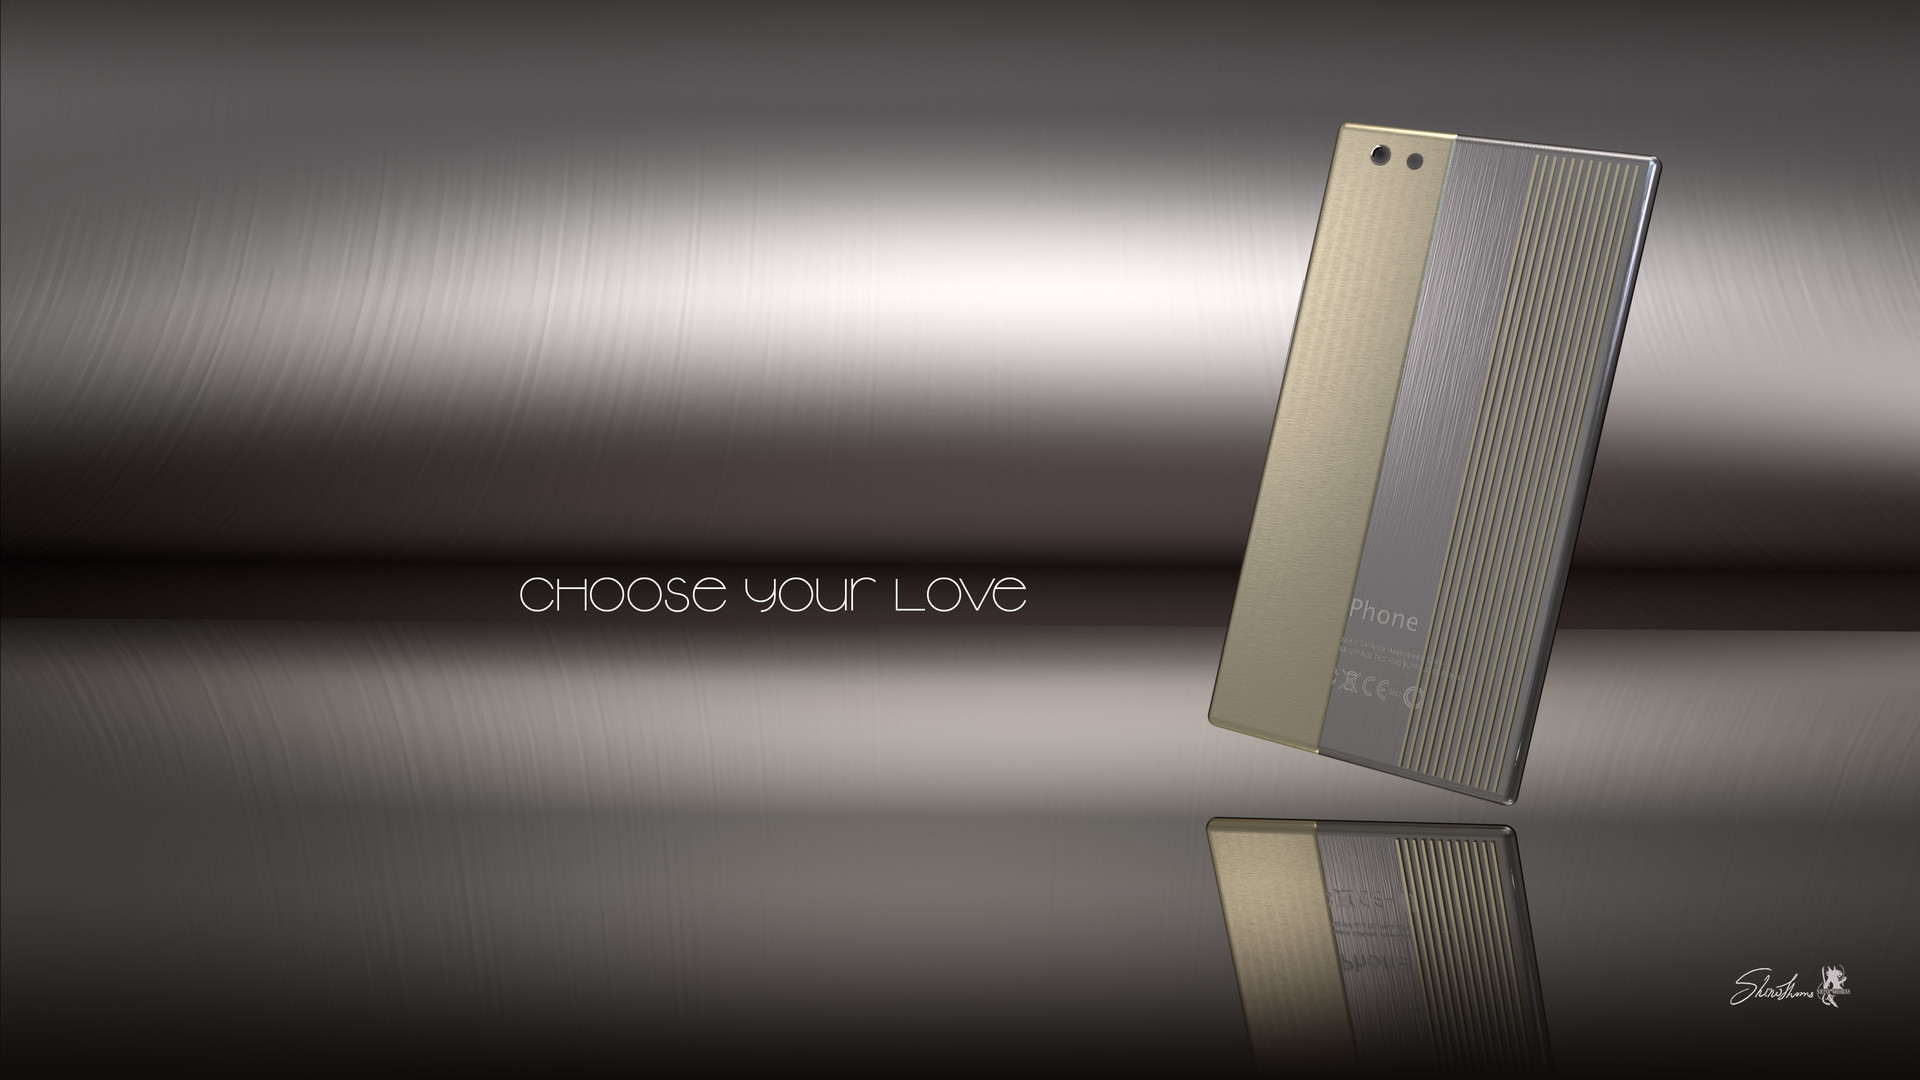 Phone Design - Choose your love